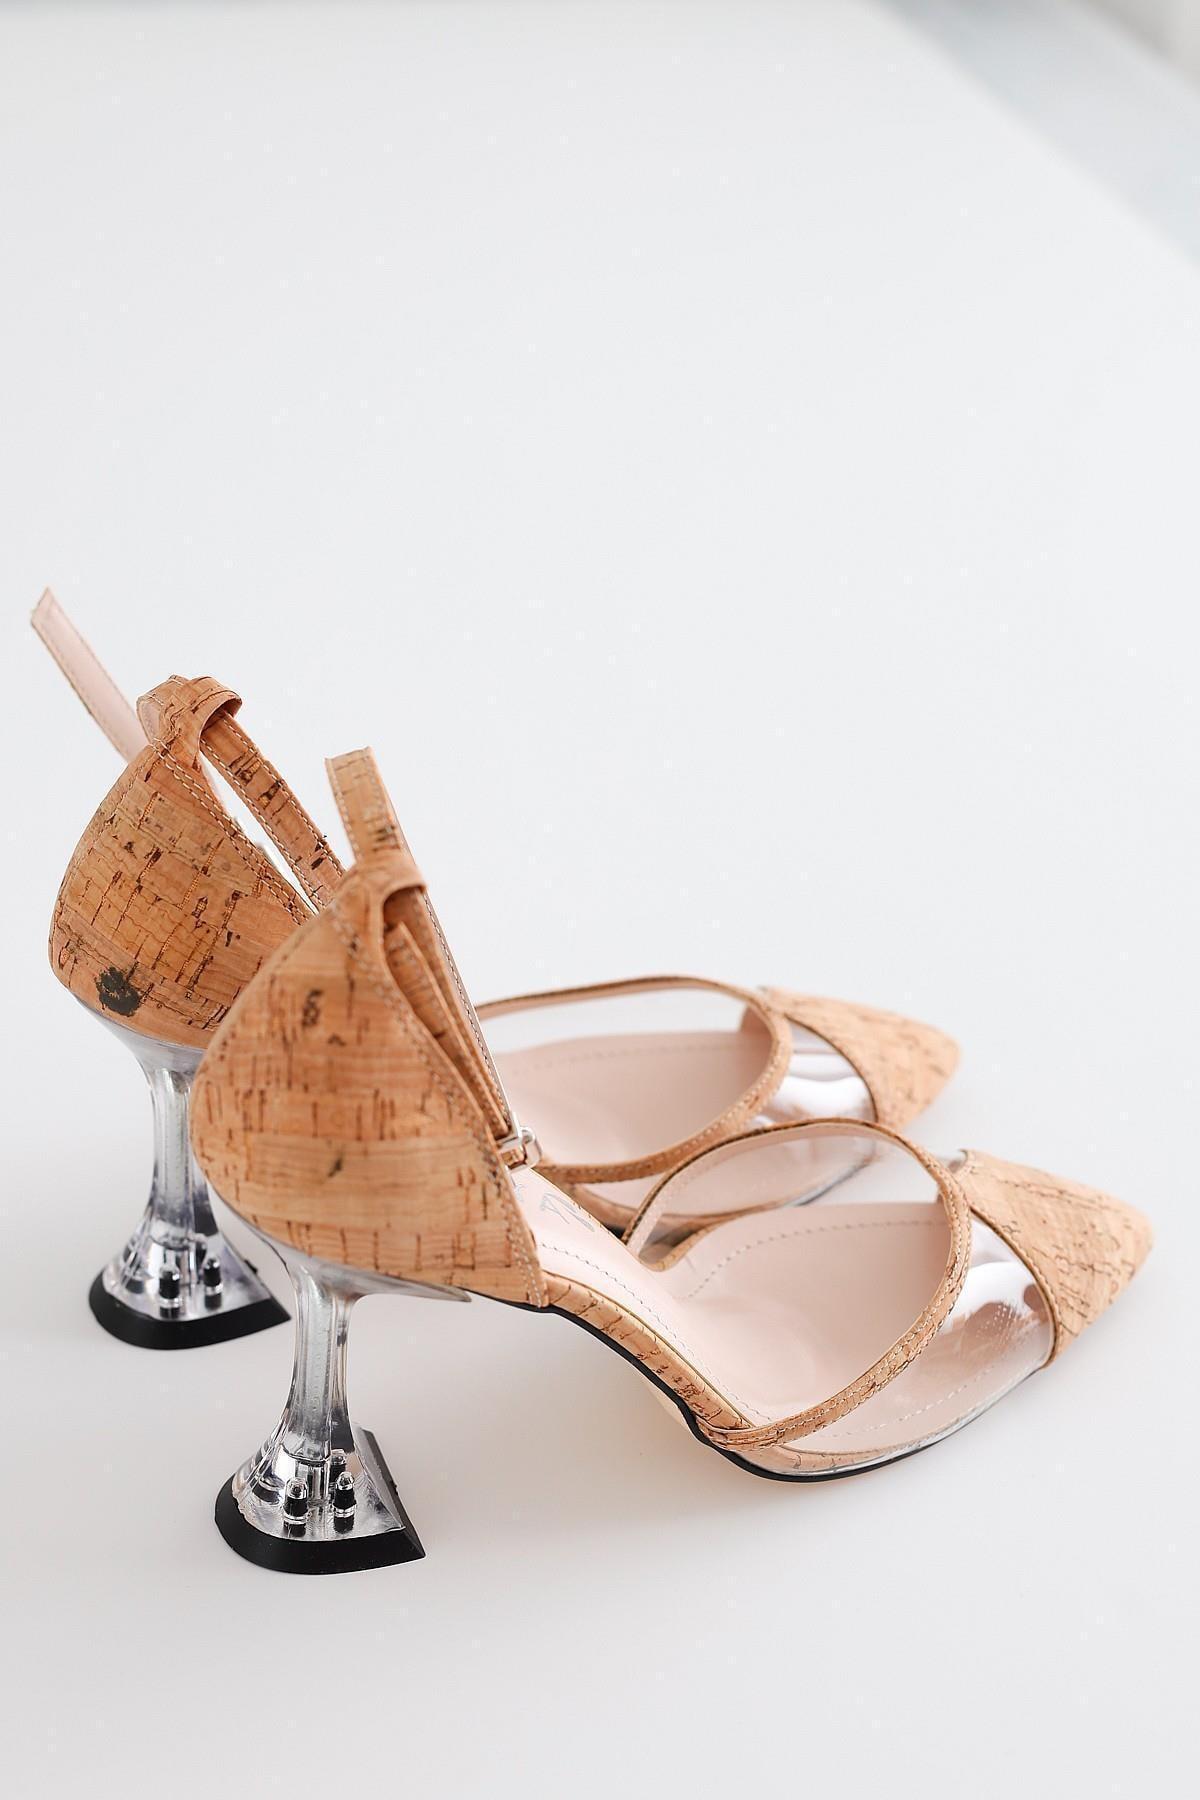 Limoya Breanna Ahşap Bilekten Tek Bantlı Şeffaf Topuklu Stiletto 1